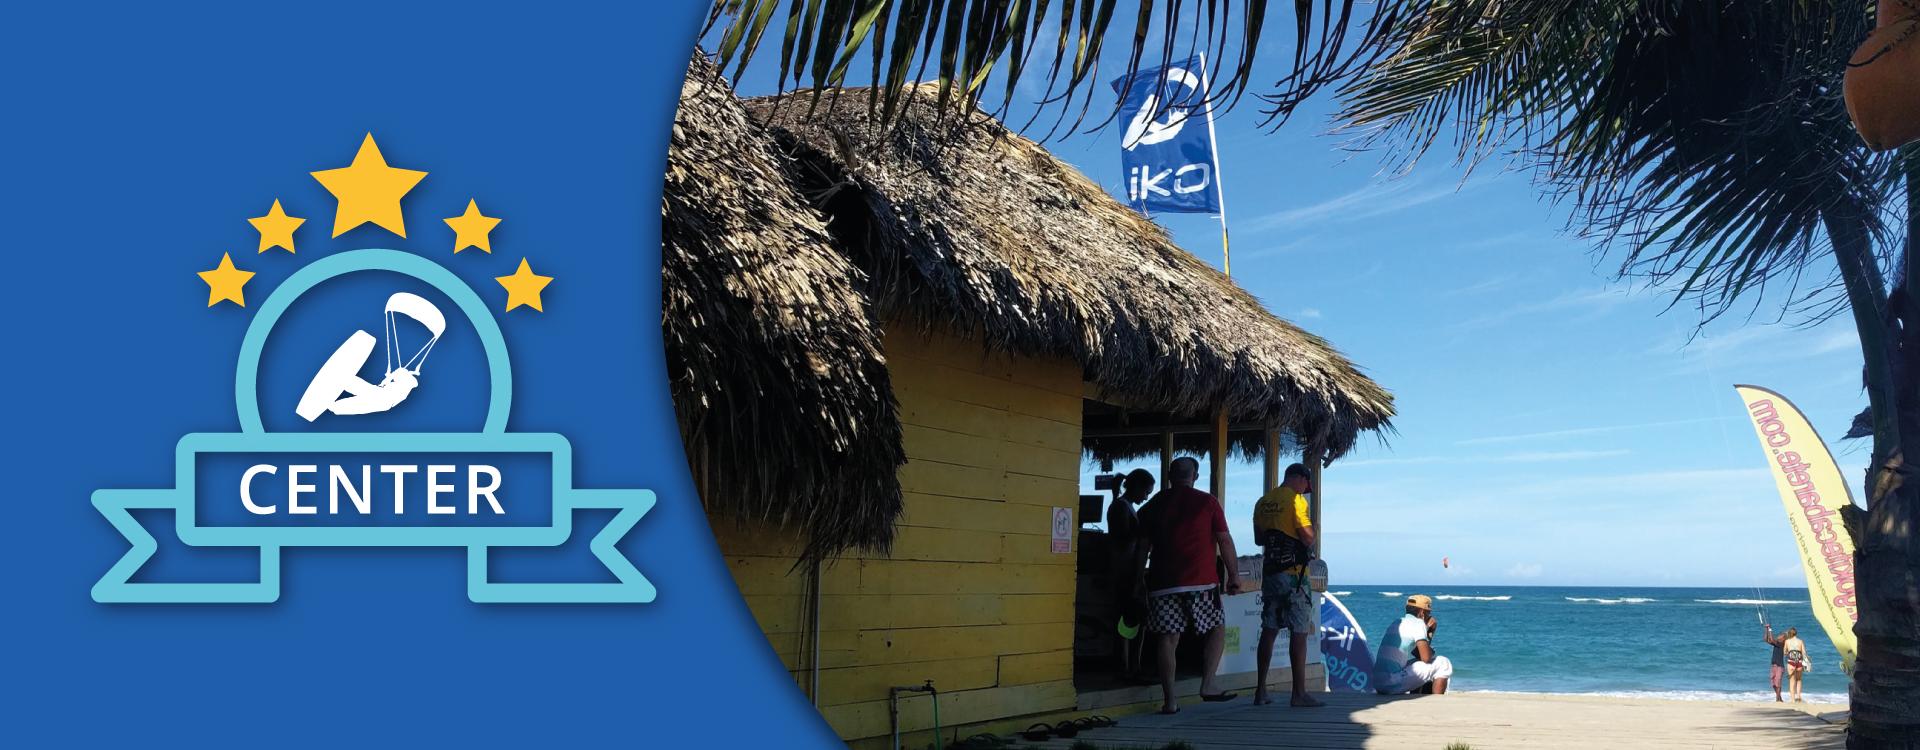 kite school iko center